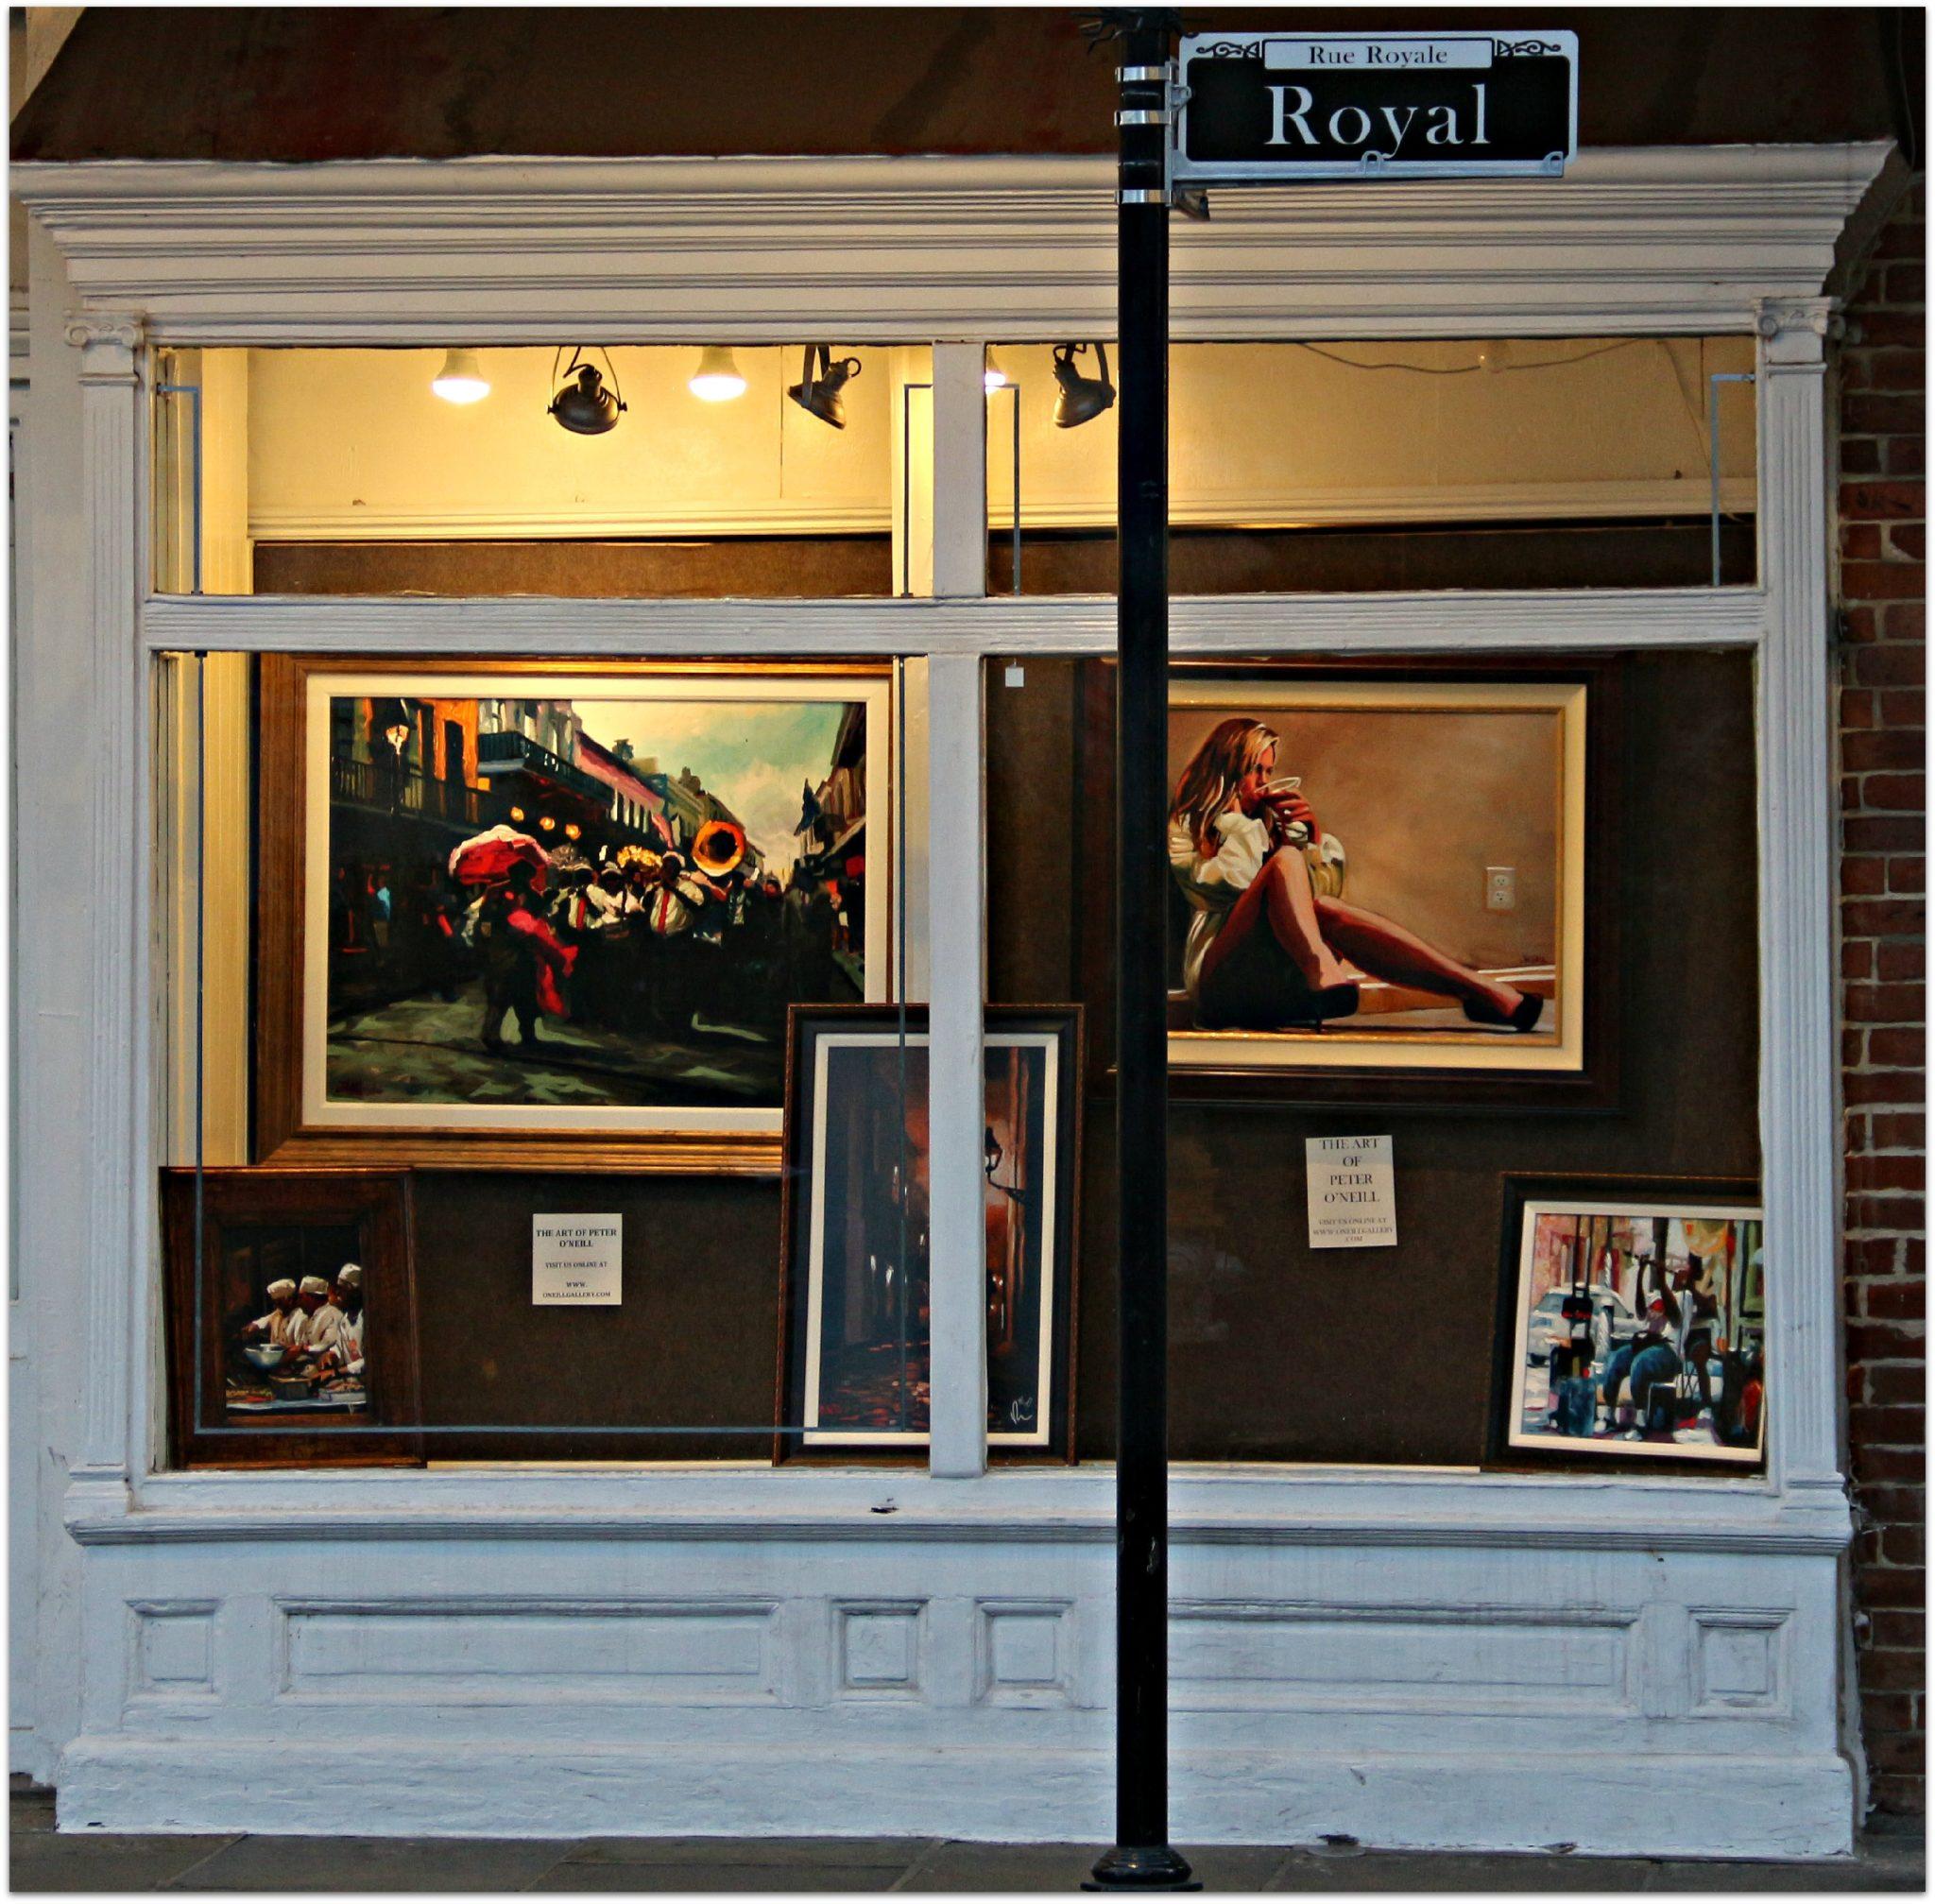 Royal Street Art Gallery